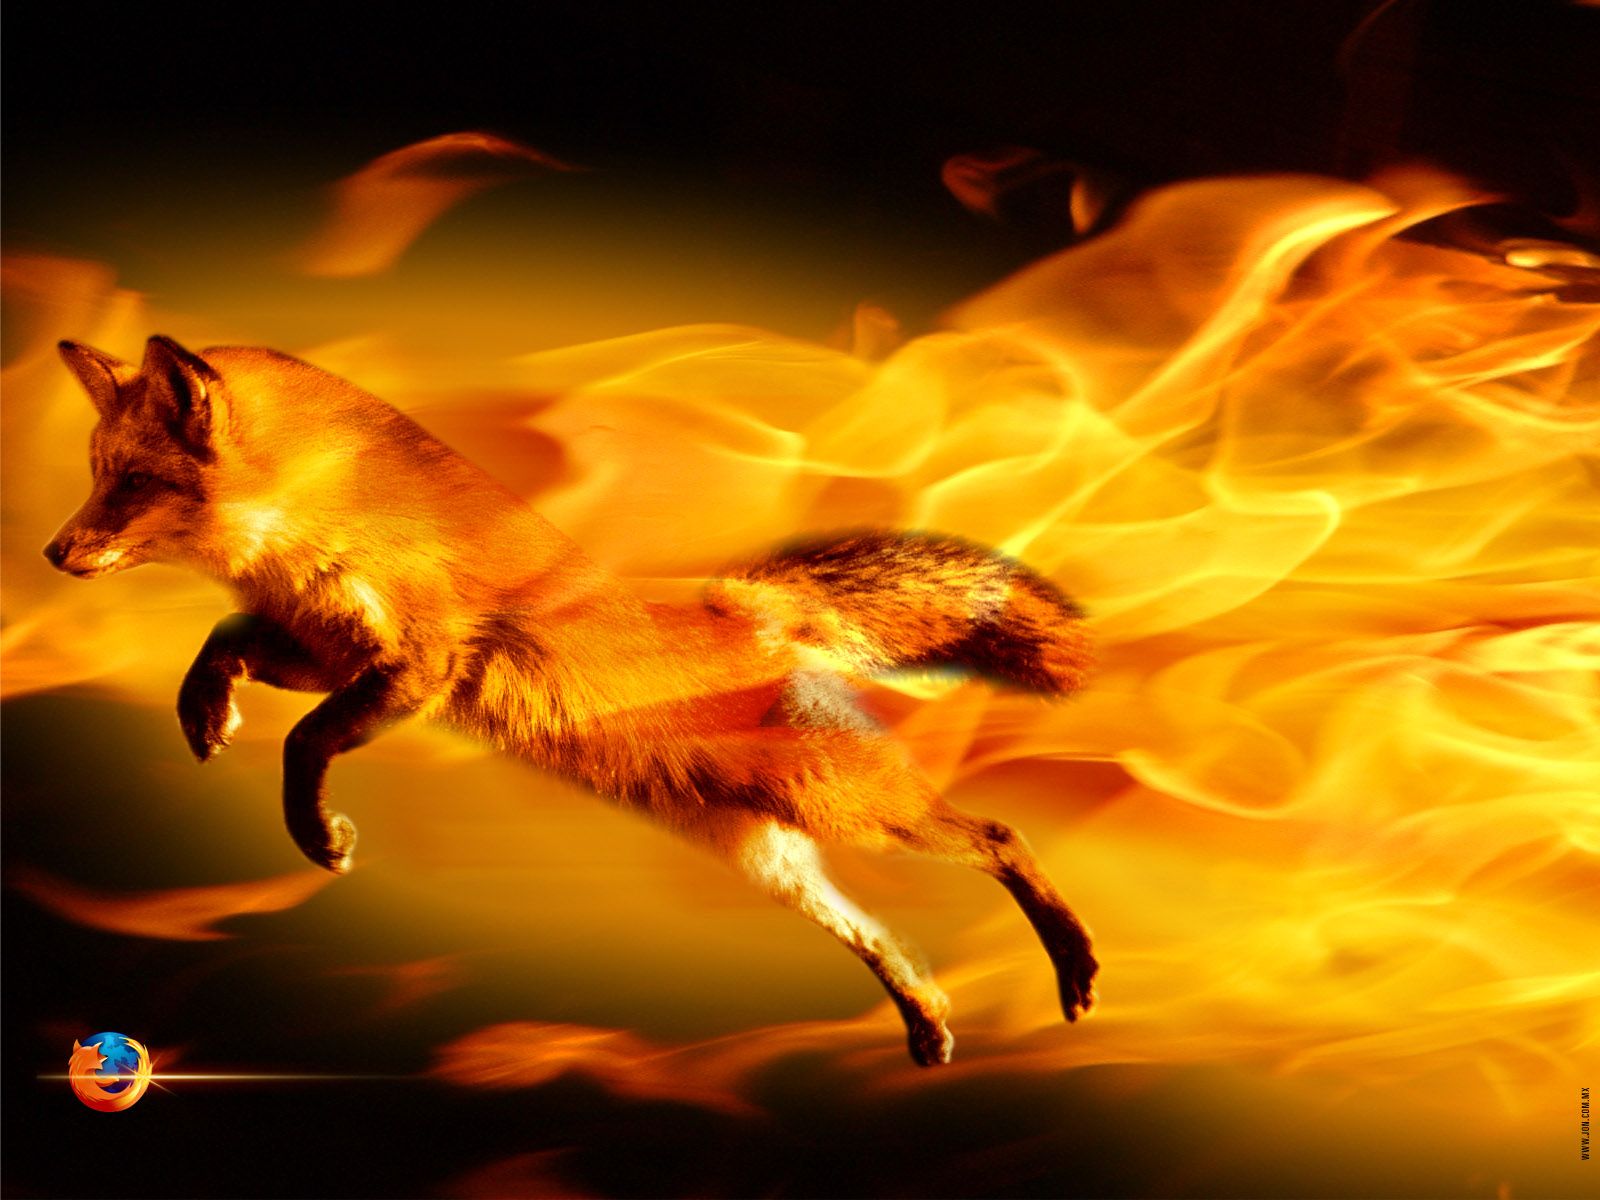 https://4.bp.blogspot.com/-yrZ7a0mFFNo/T-JGSqM__KI/AAAAAAAAA4k/01foxSe2EVU/s1600/wallpaper-firefox-hd-4.jpg